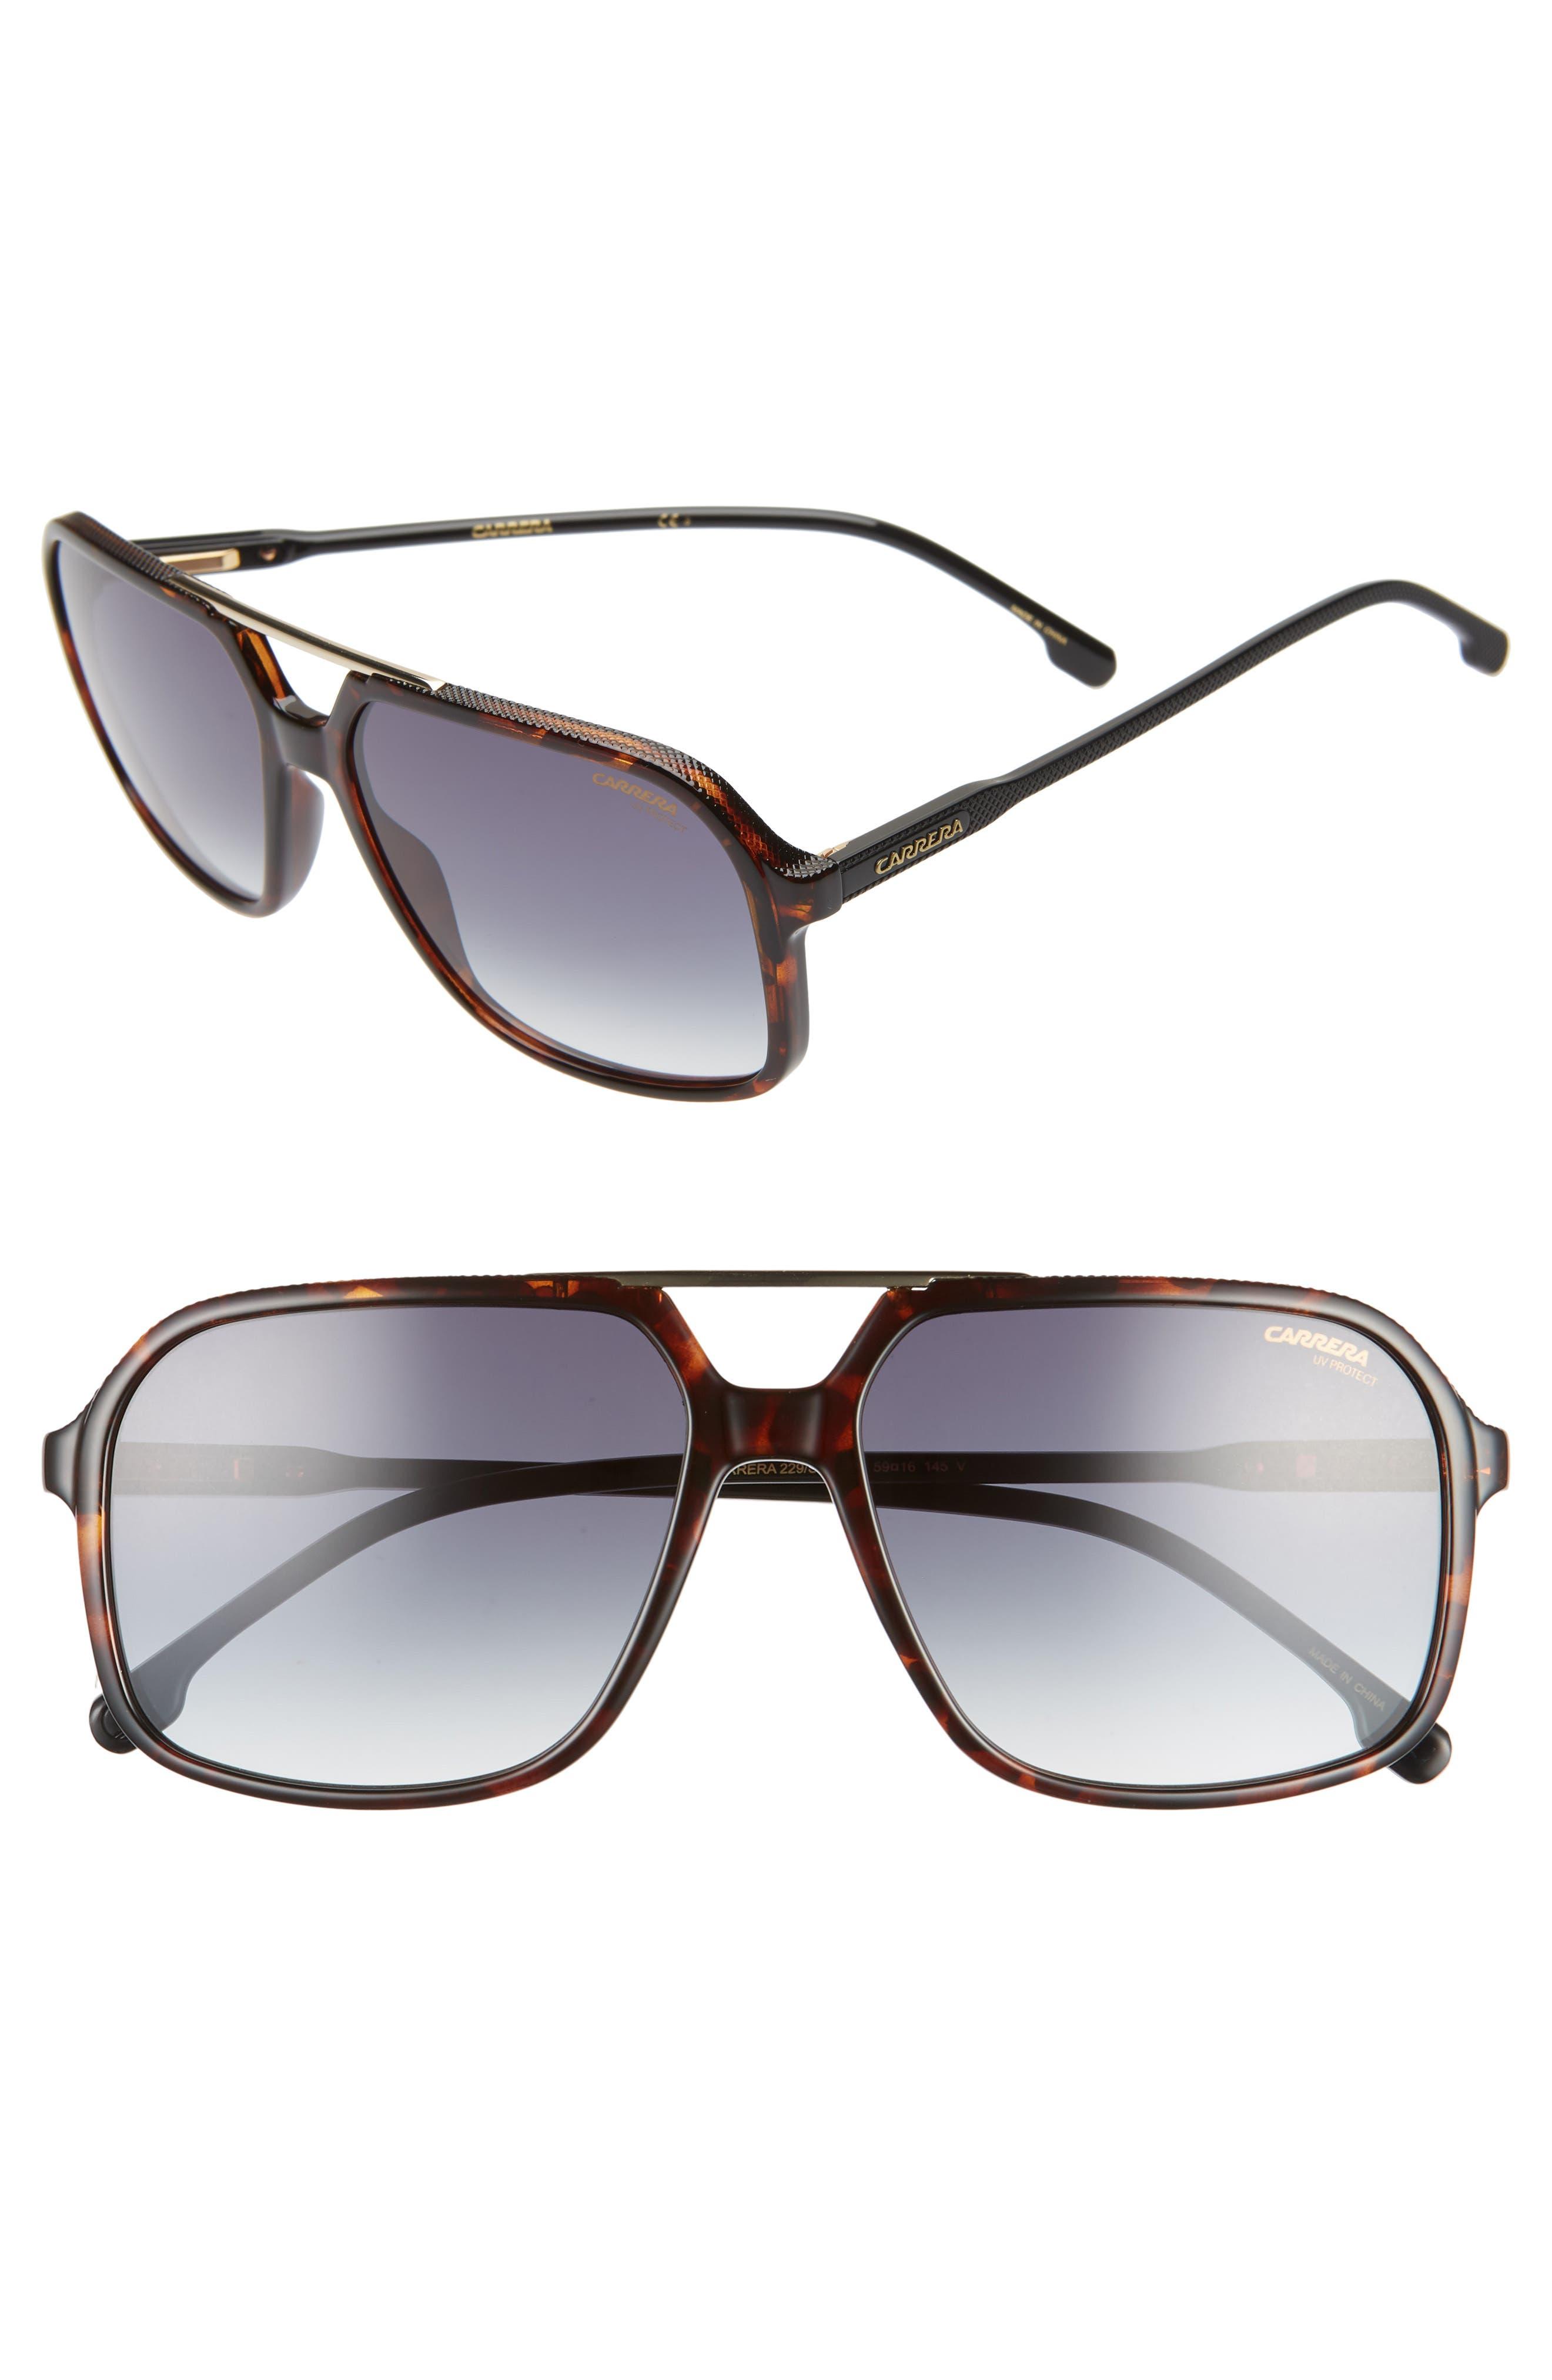 59mm Polarized Aviator Sunglasses